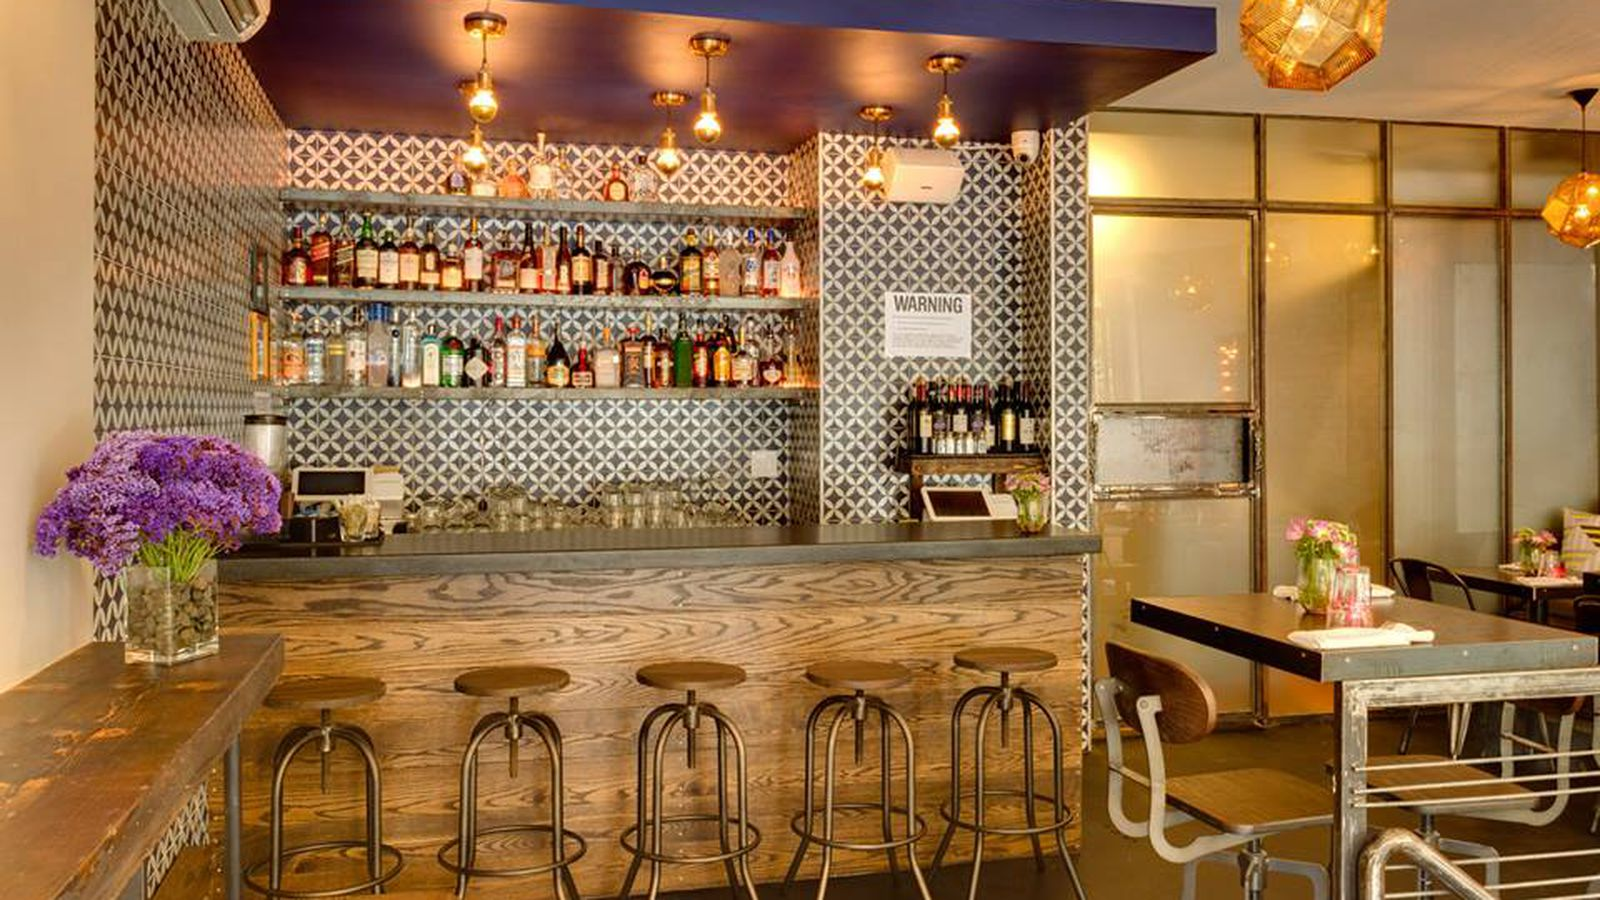 Zabb sake bar secara gossip coffee and more openings for Aura thai fusion cuisine new york ny